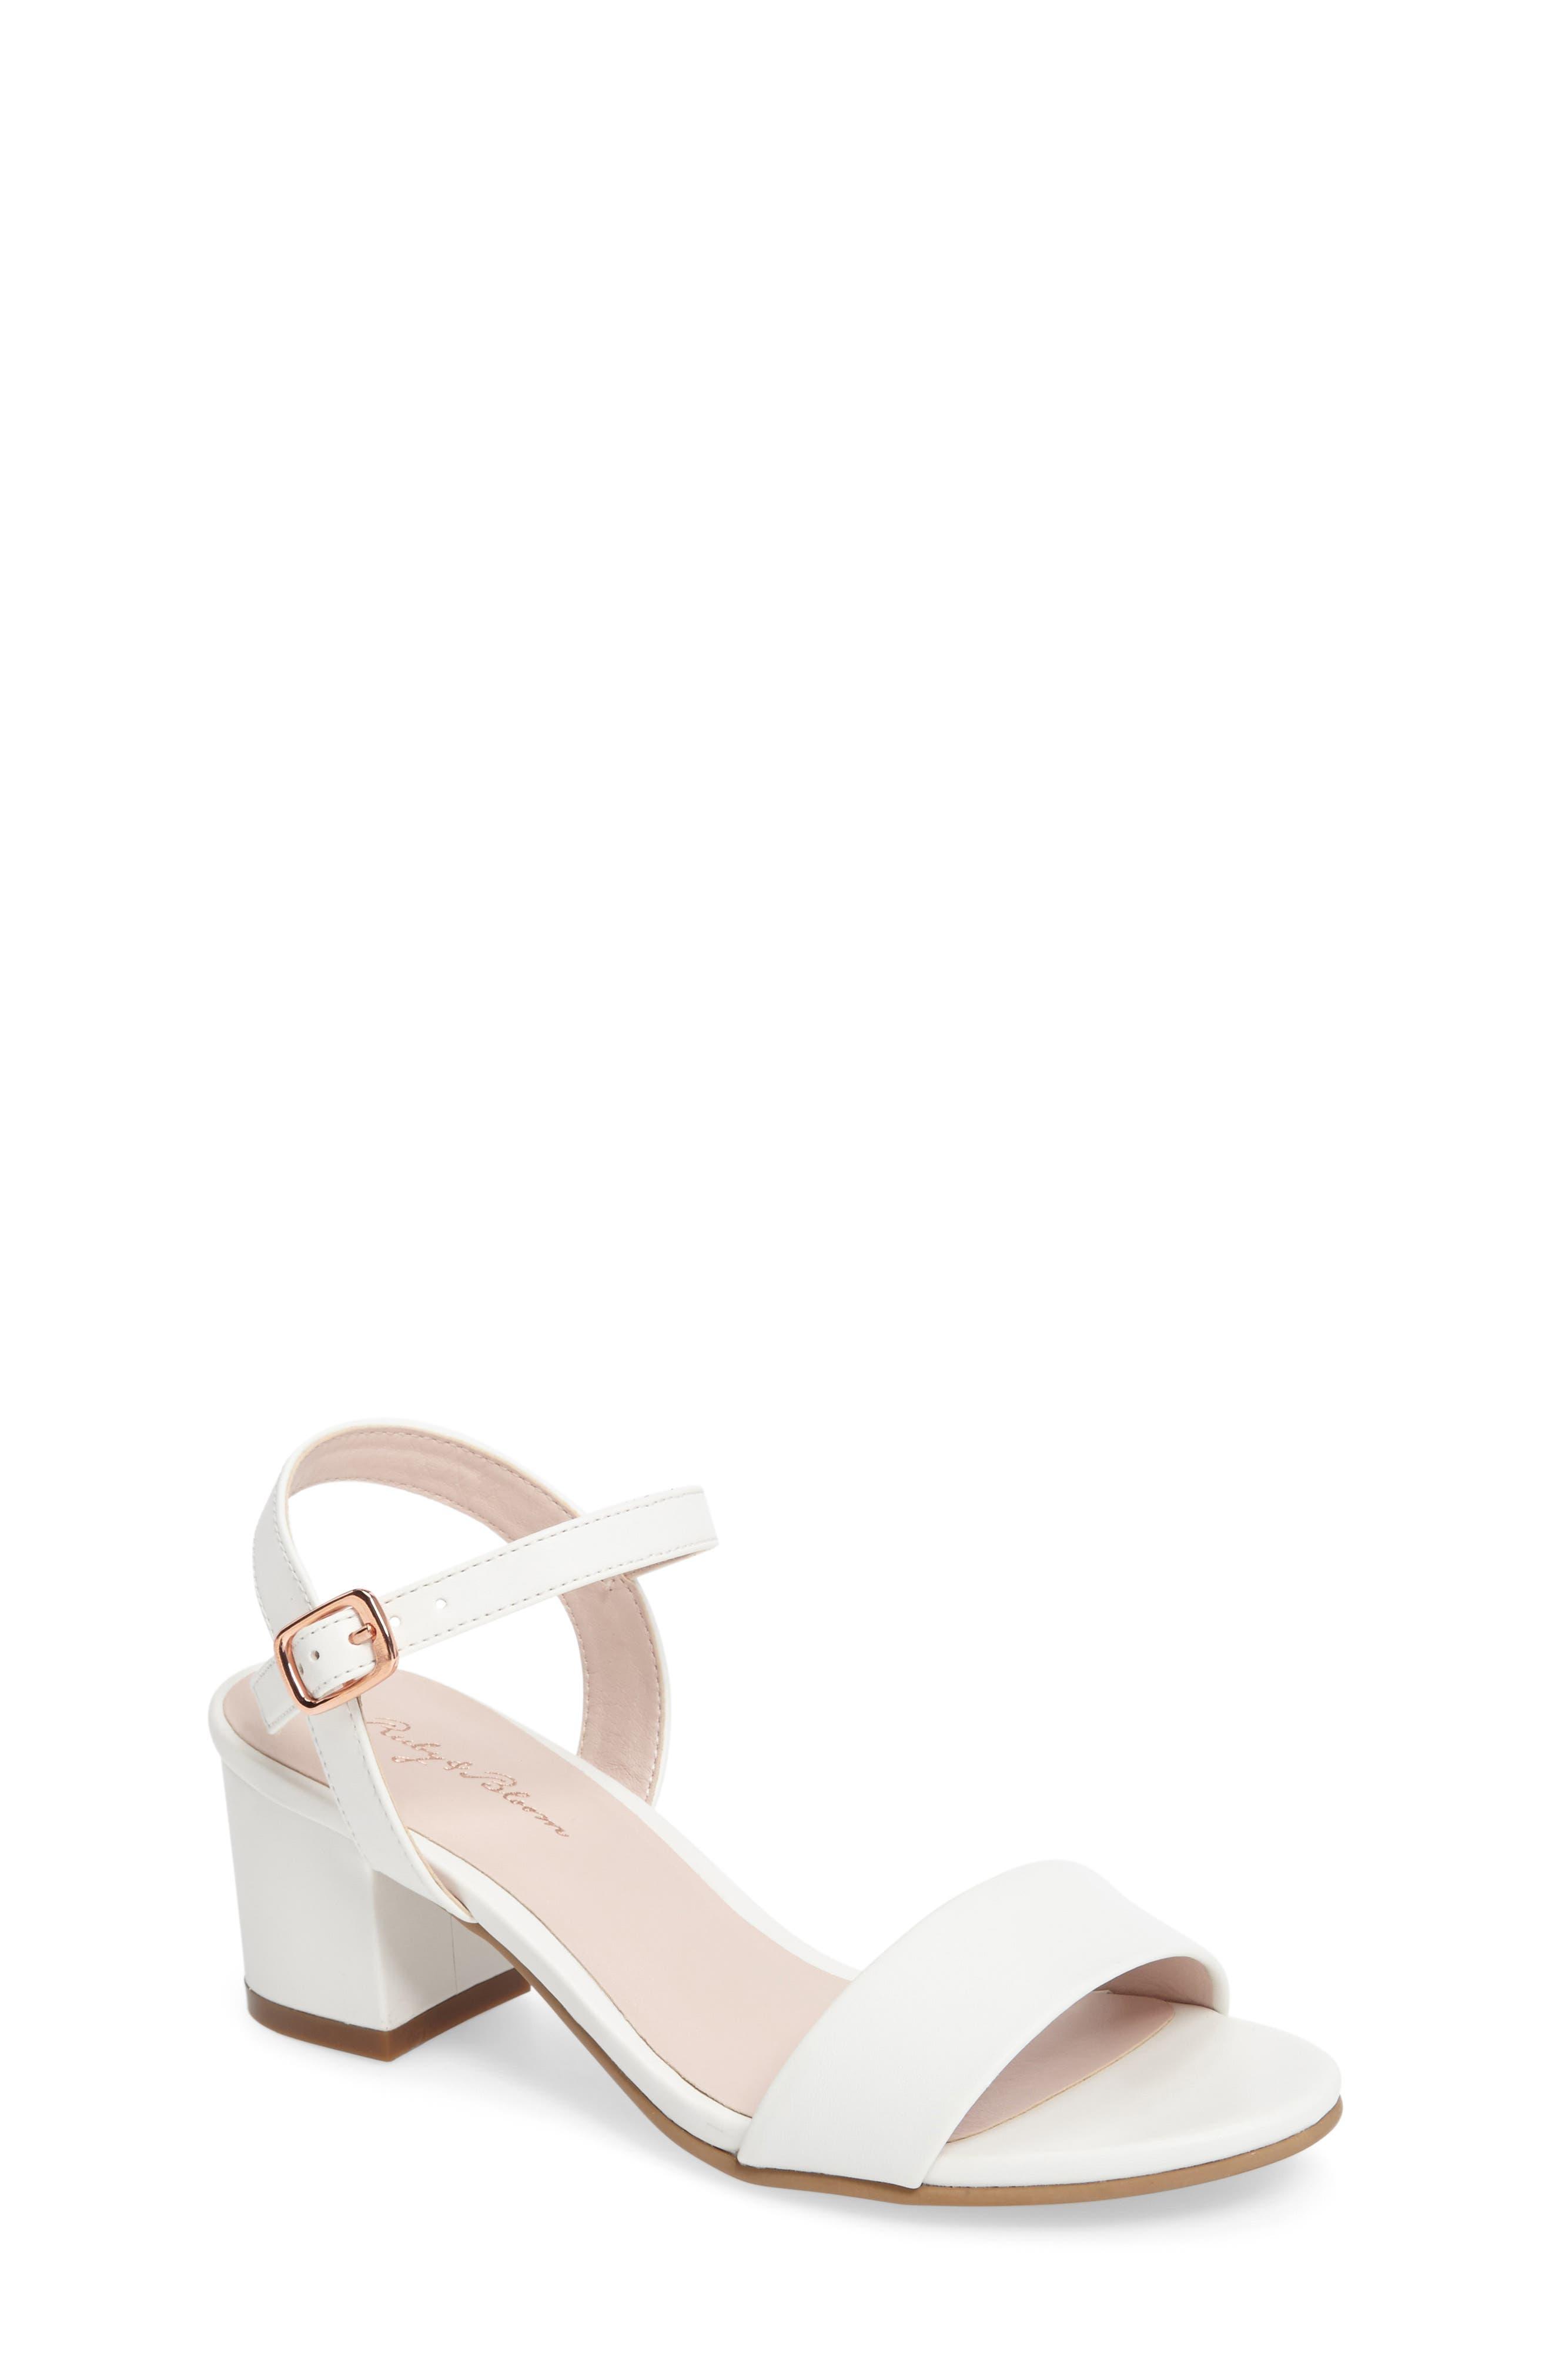 Danni Block Heel Sandal,                             Main thumbnail 1, color,                             WHITE FAUX LEATHER